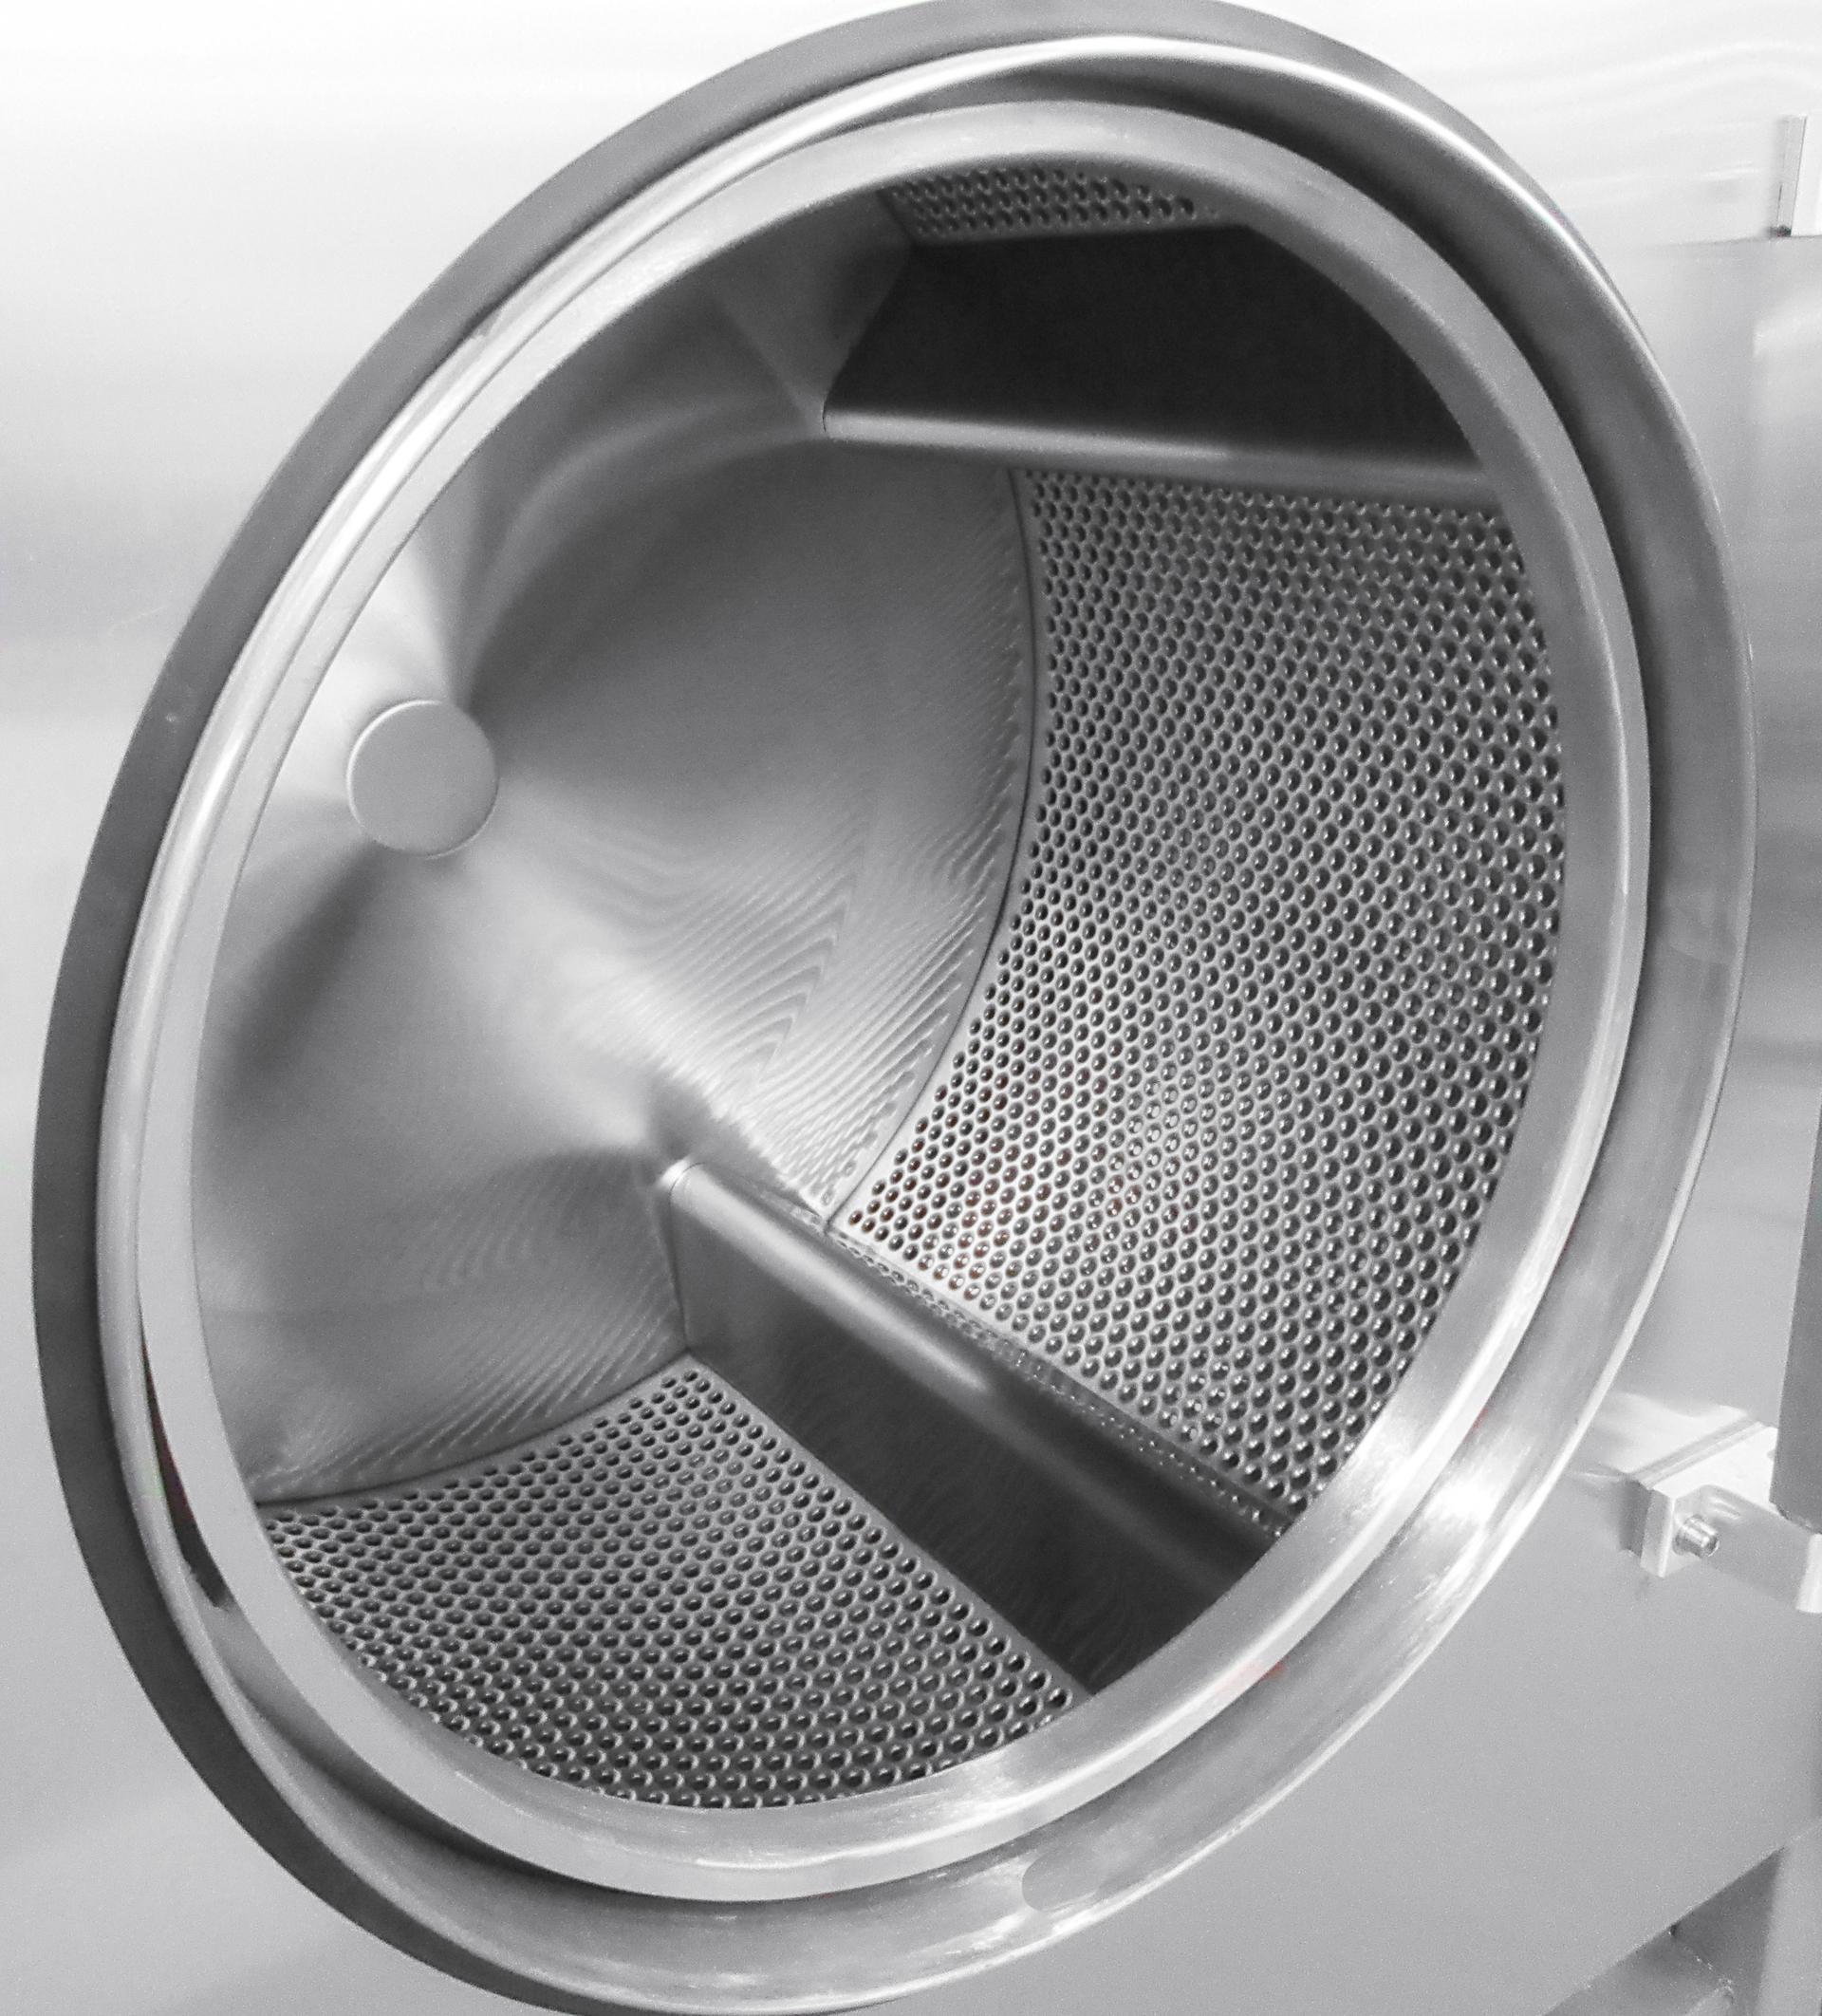 50kg-150kg heavy duty washing machine,big capacity